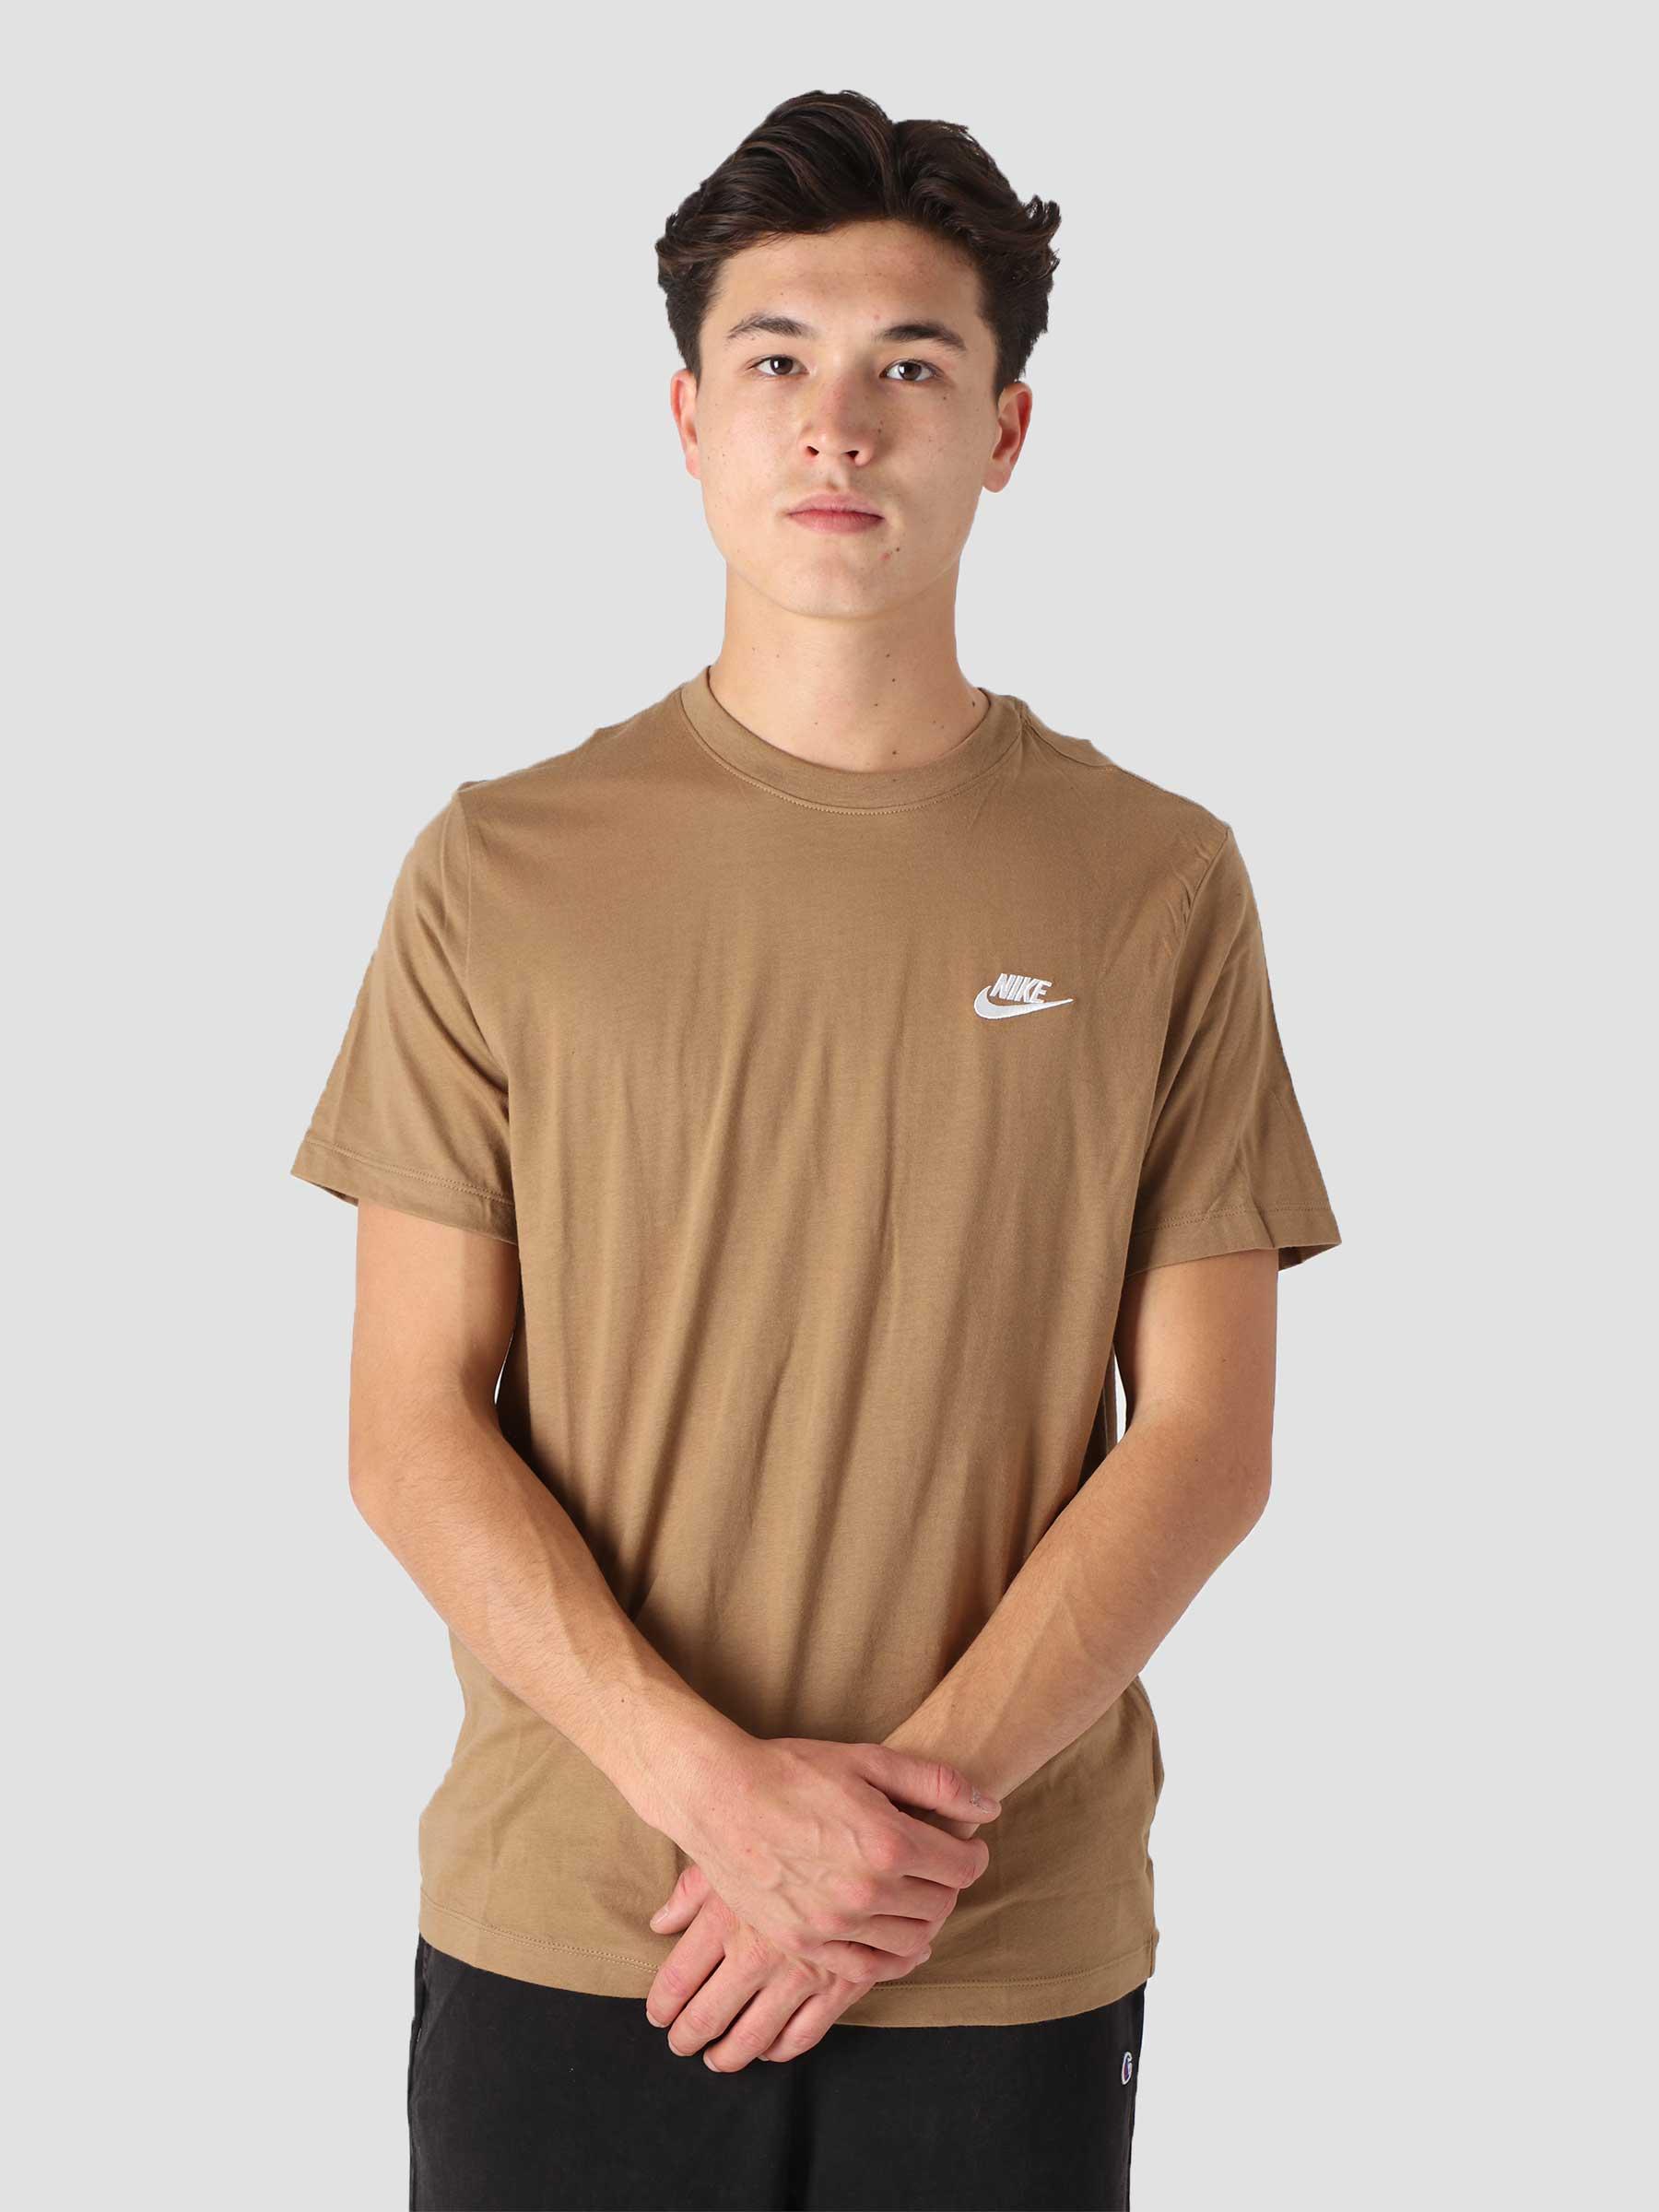 M Nsw Club T Shirt Dk Driftwood White AR4997-258